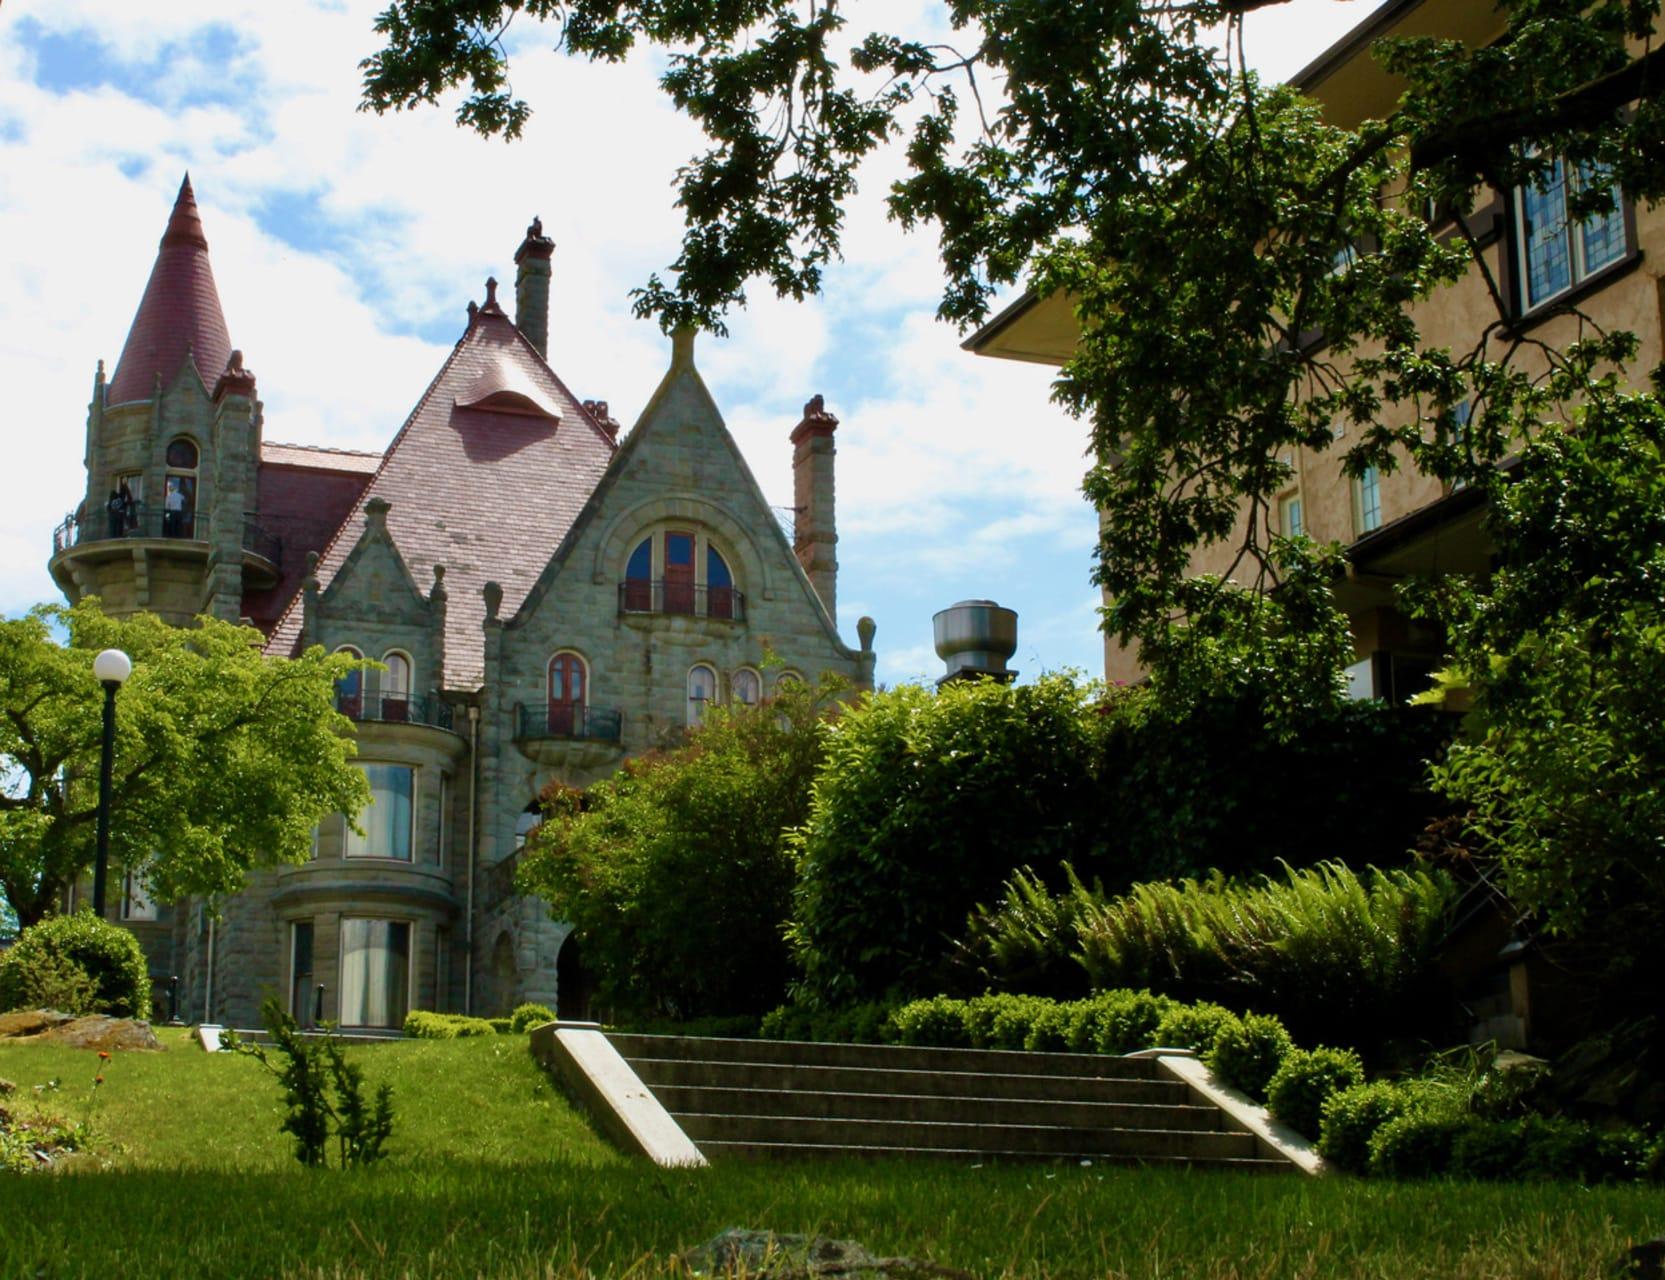 Victoria, BC - Craigdarroch Castle and Stunning Gardens